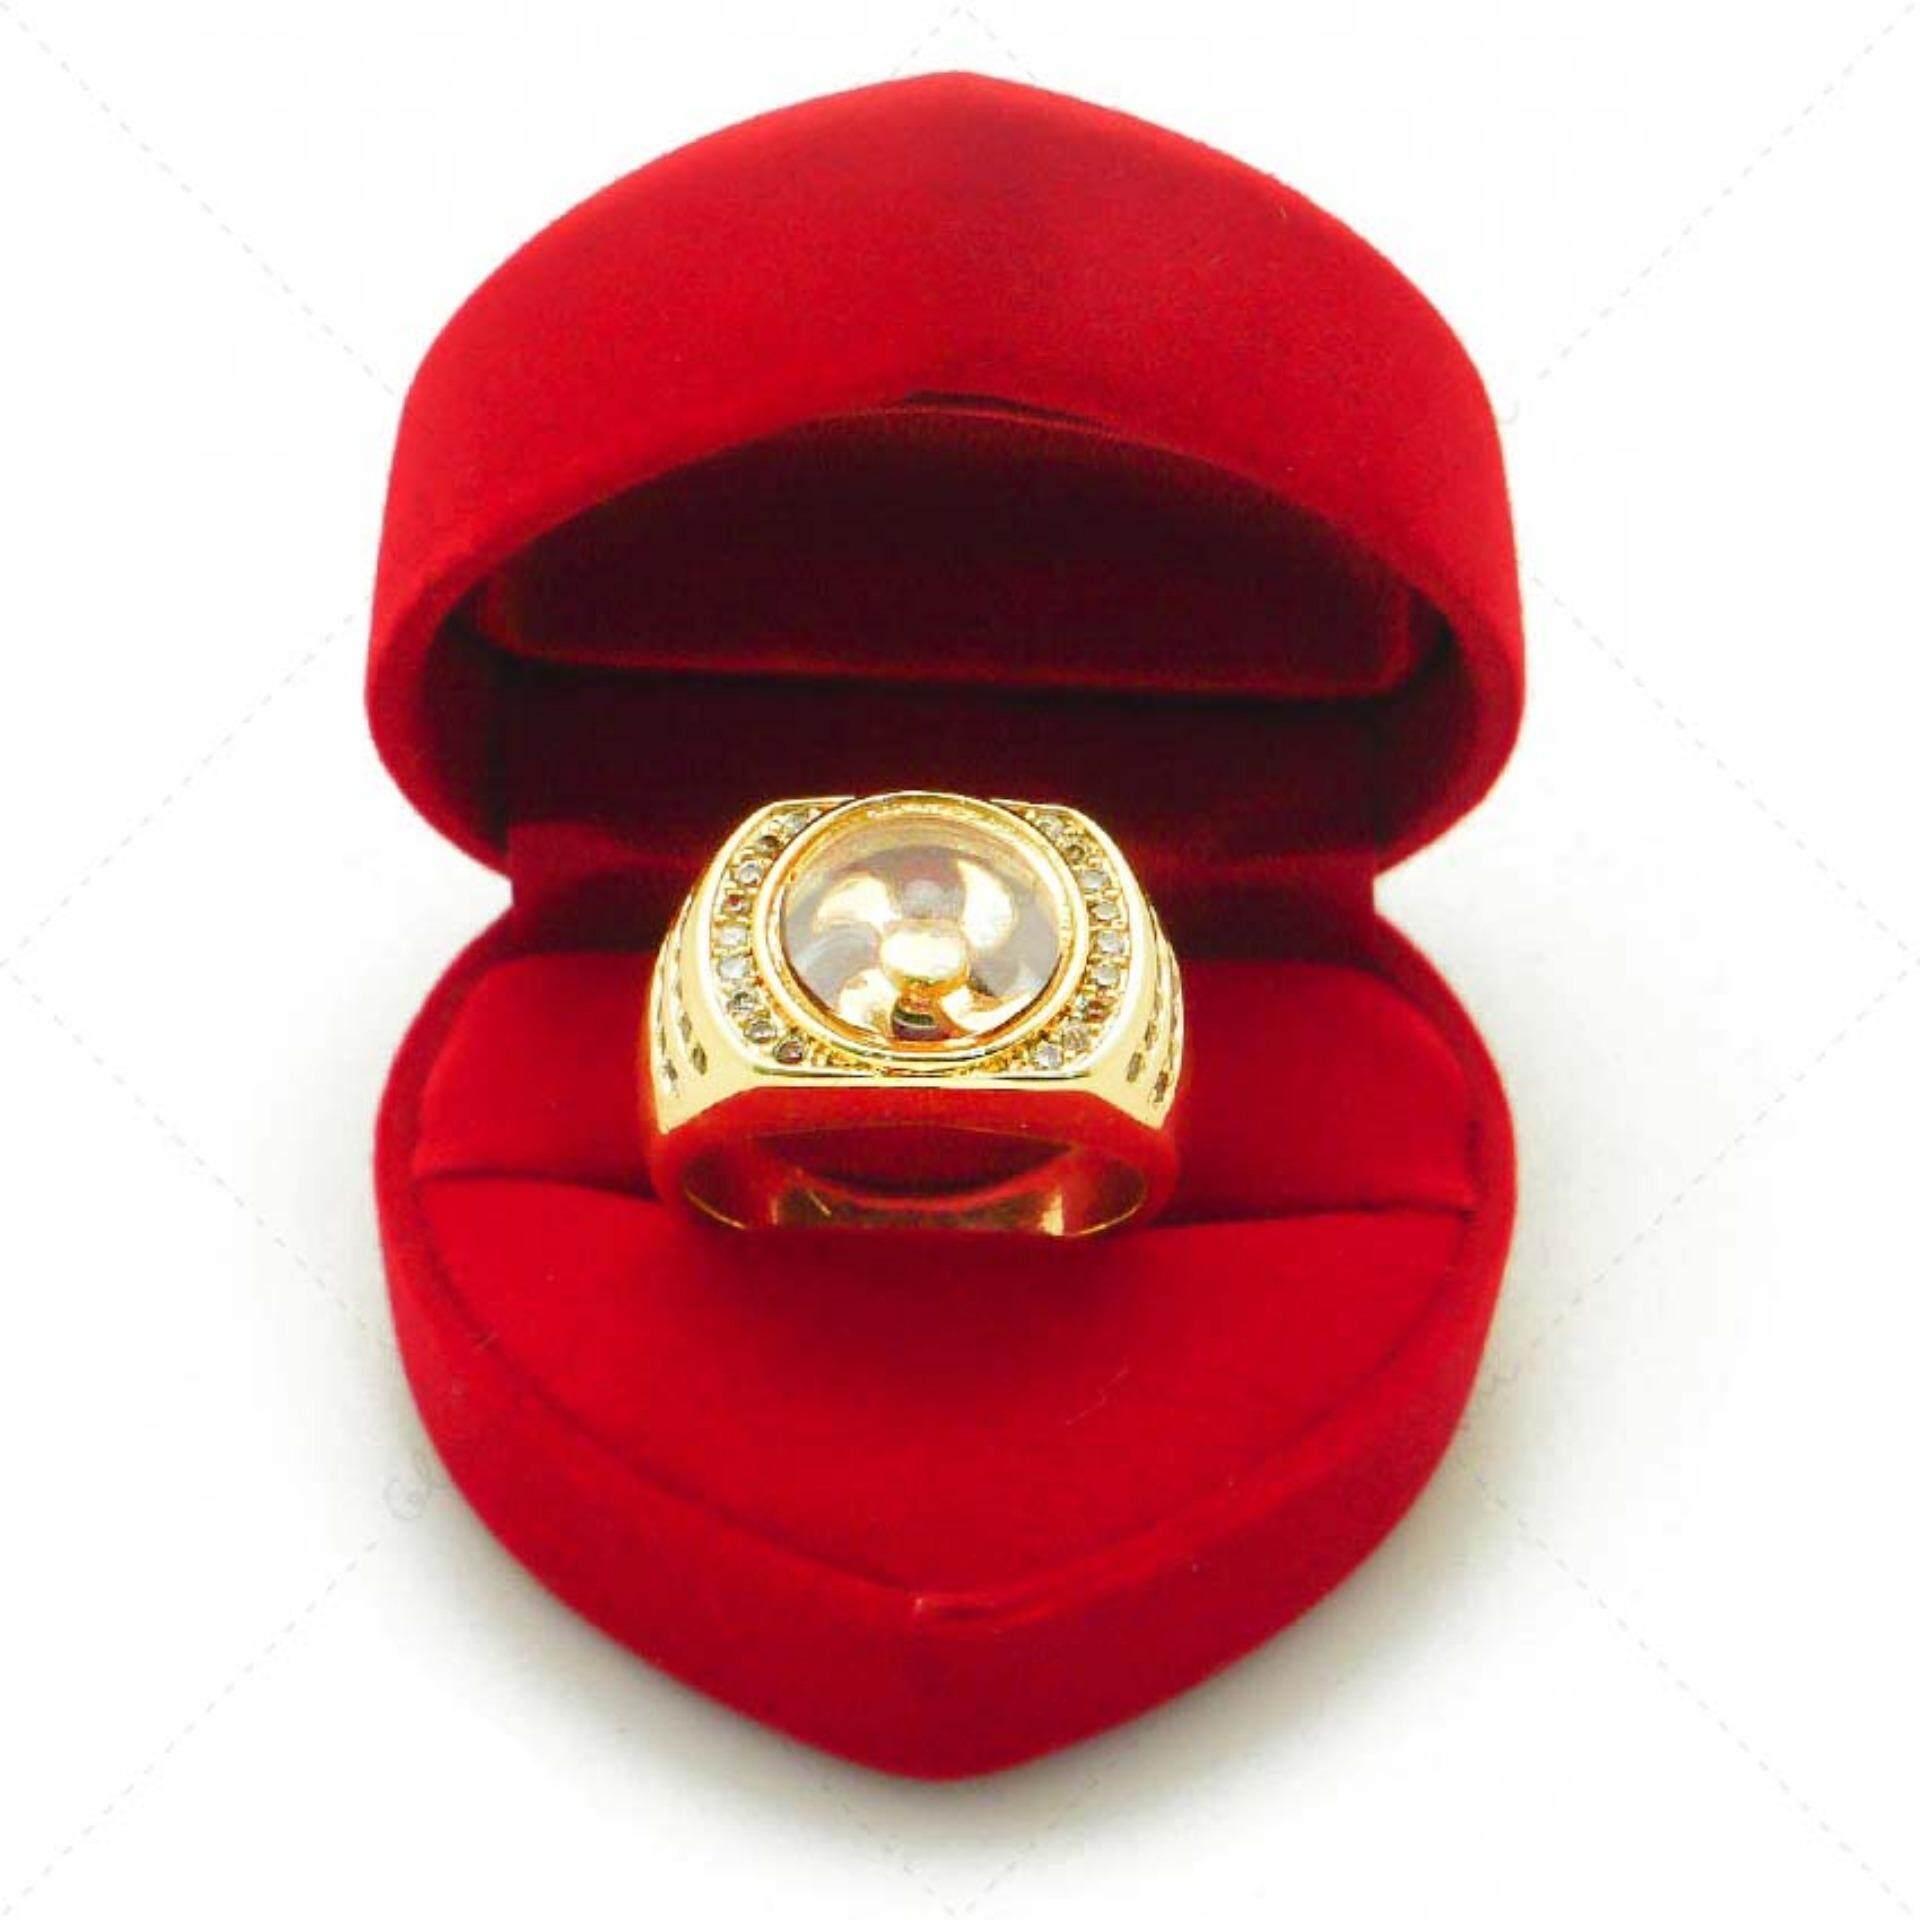 Bewi G แหวนผู้หญิง สไตล์ แหวนเสริมดวง Ring แหวนกังหัน นำโชค แชกงหมิว กังหันหมุนได้ ประดับเพชร Cz ชุบทอง เหมือนทองแท้ หรูหรา รุ่น Bg R0032 สีทอง Gold Bewi G ถูก ใน Thailand